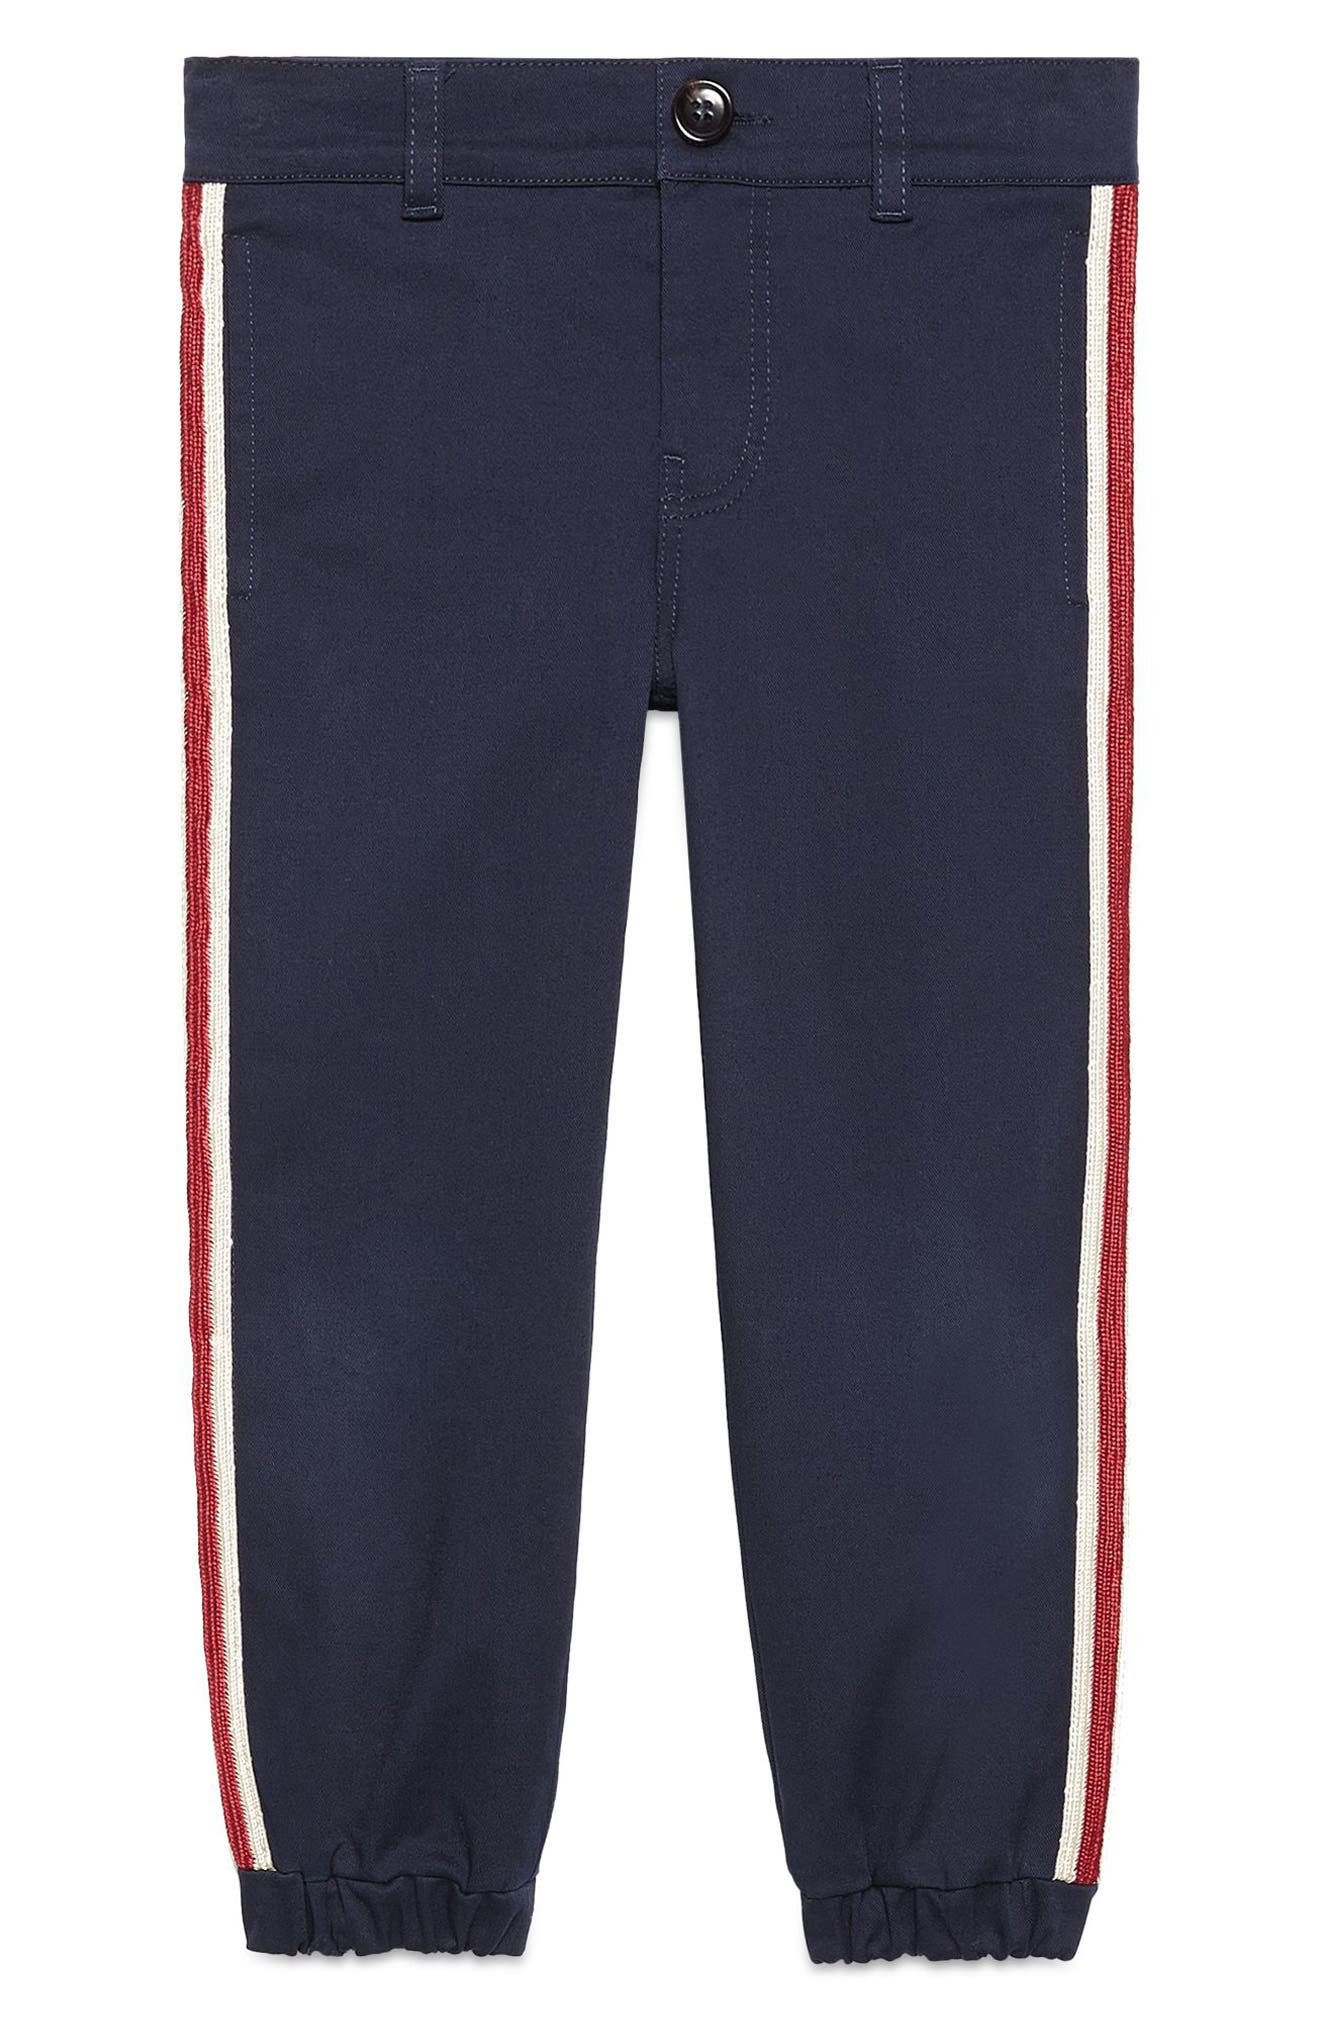 Alternate Image 1 Selected - Gucci Stripe Pants (Little Boys & Big Boys)